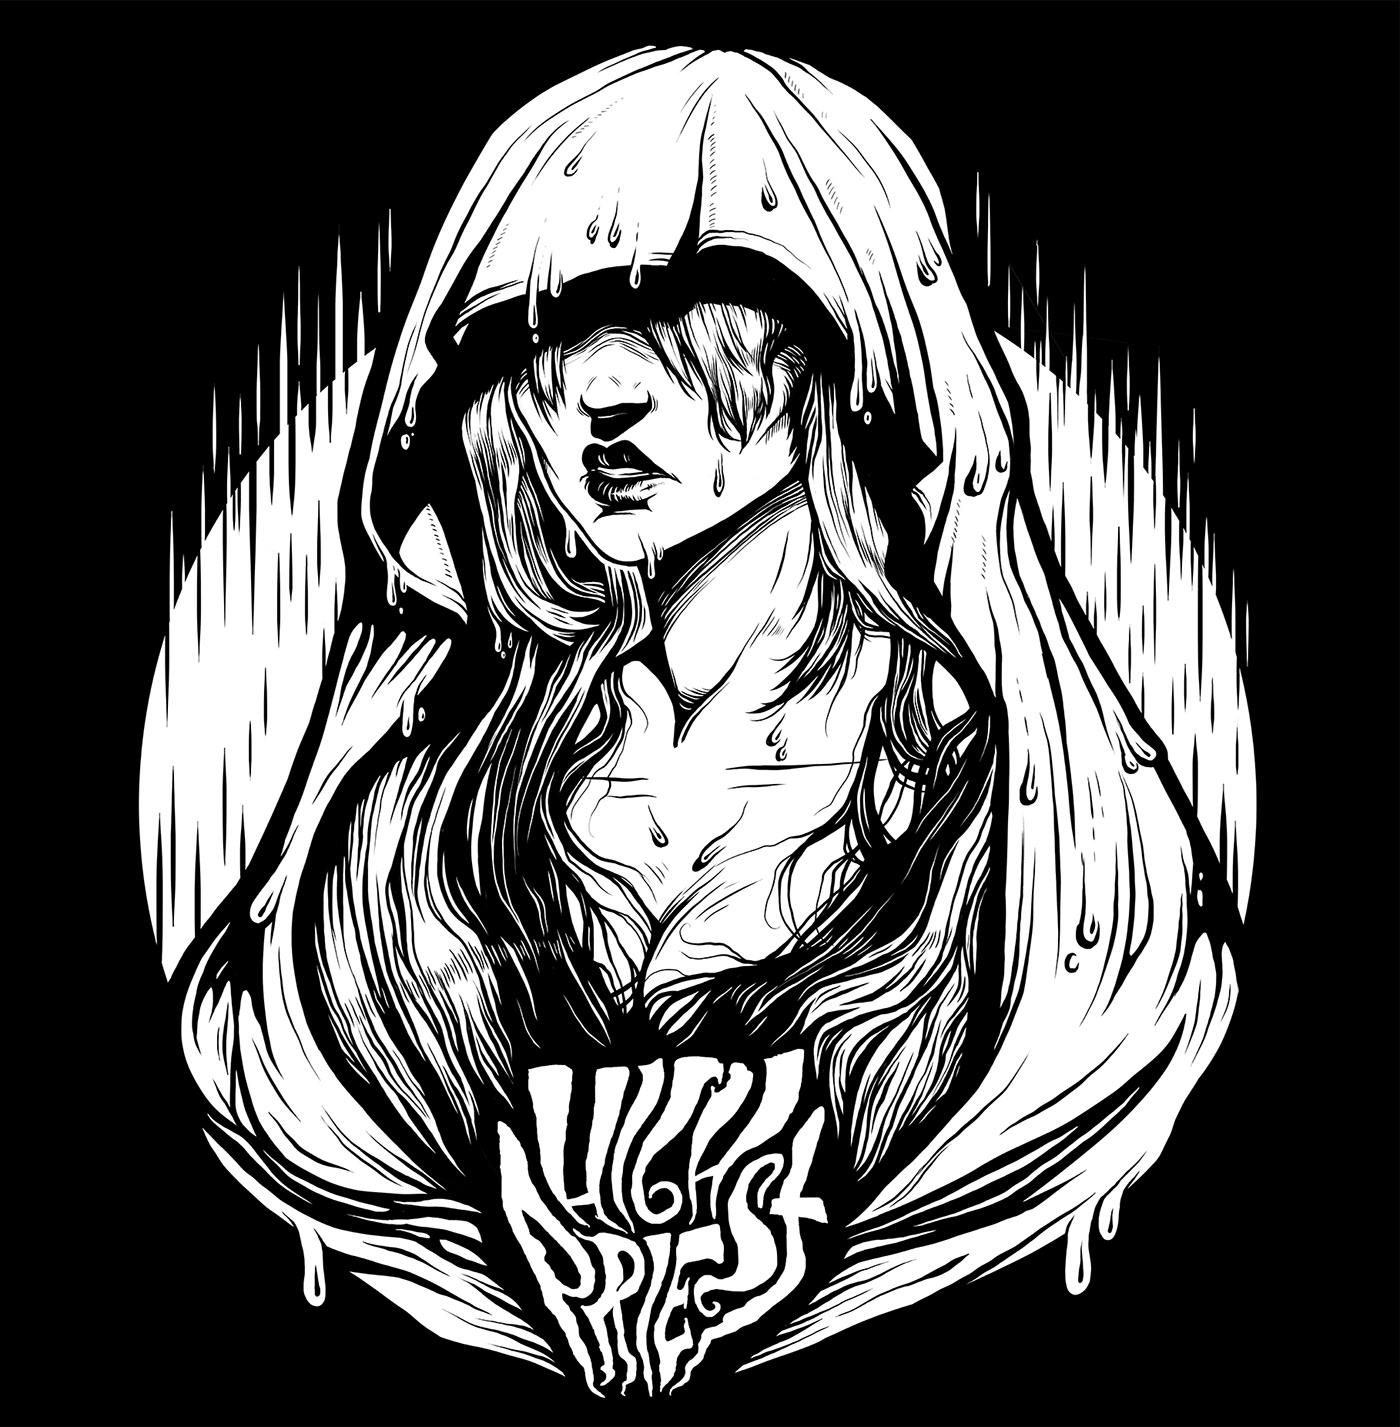 high priest doom metal band merch woman portrait ink